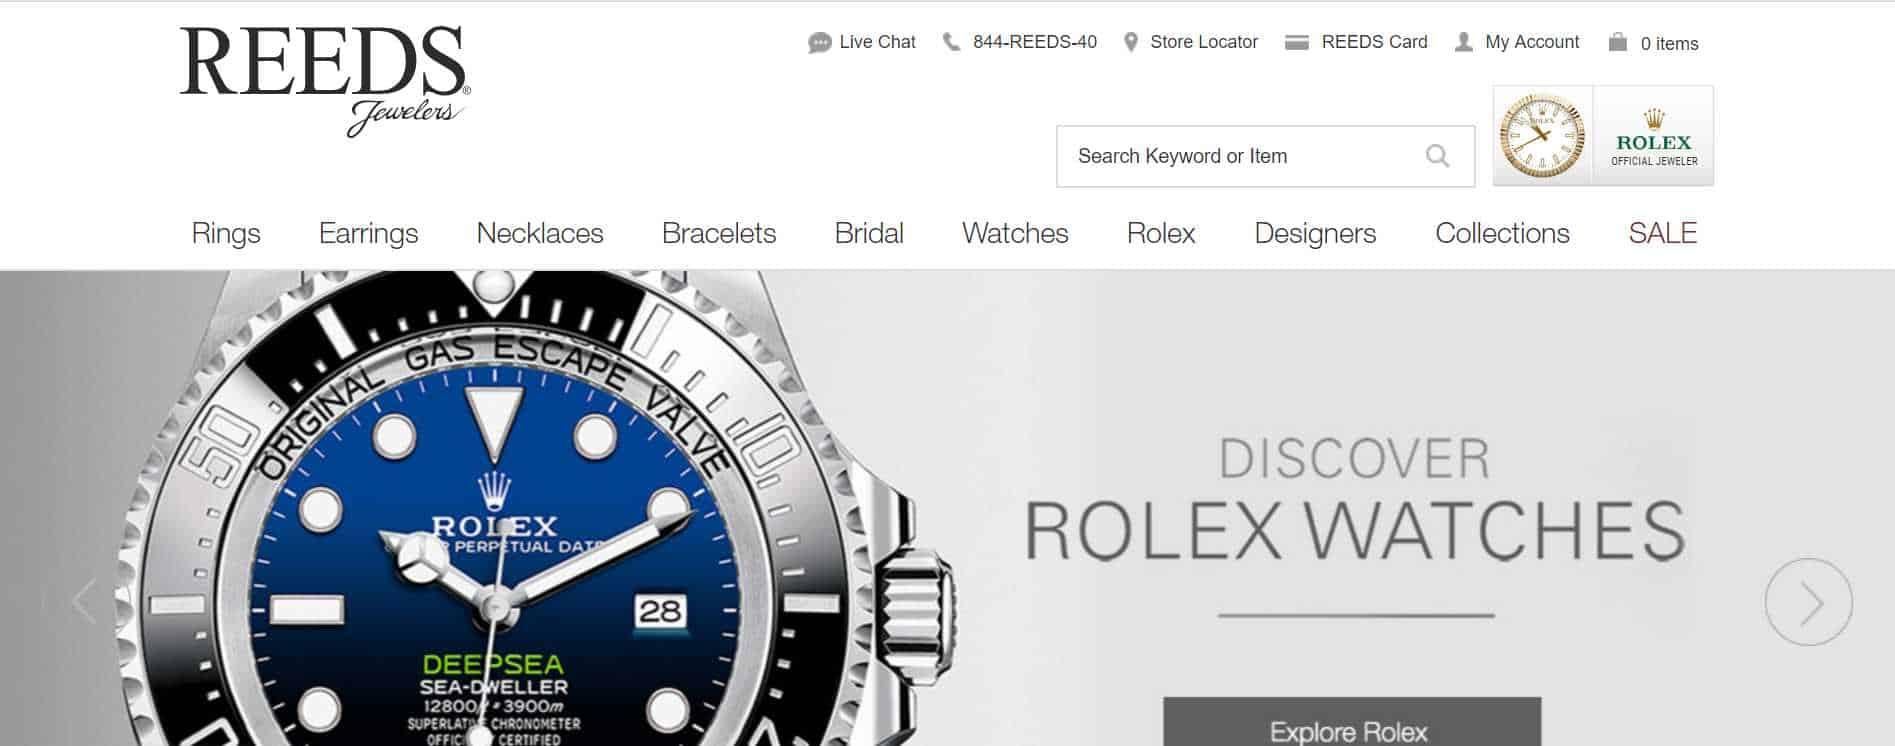 reeds luxury watches online